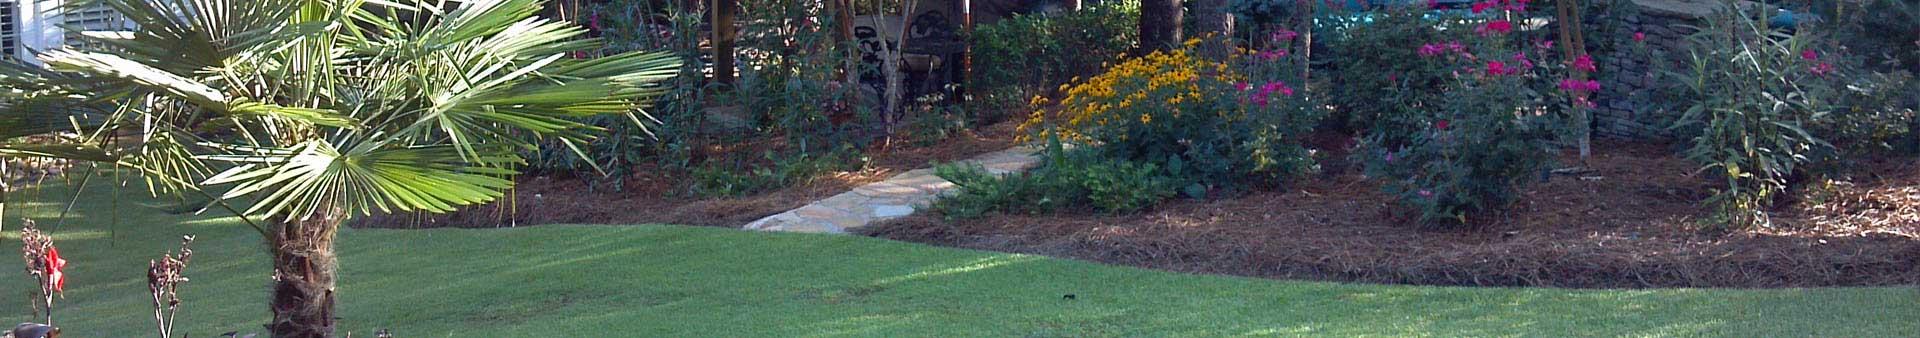 landscaping design installation in san antonio tx